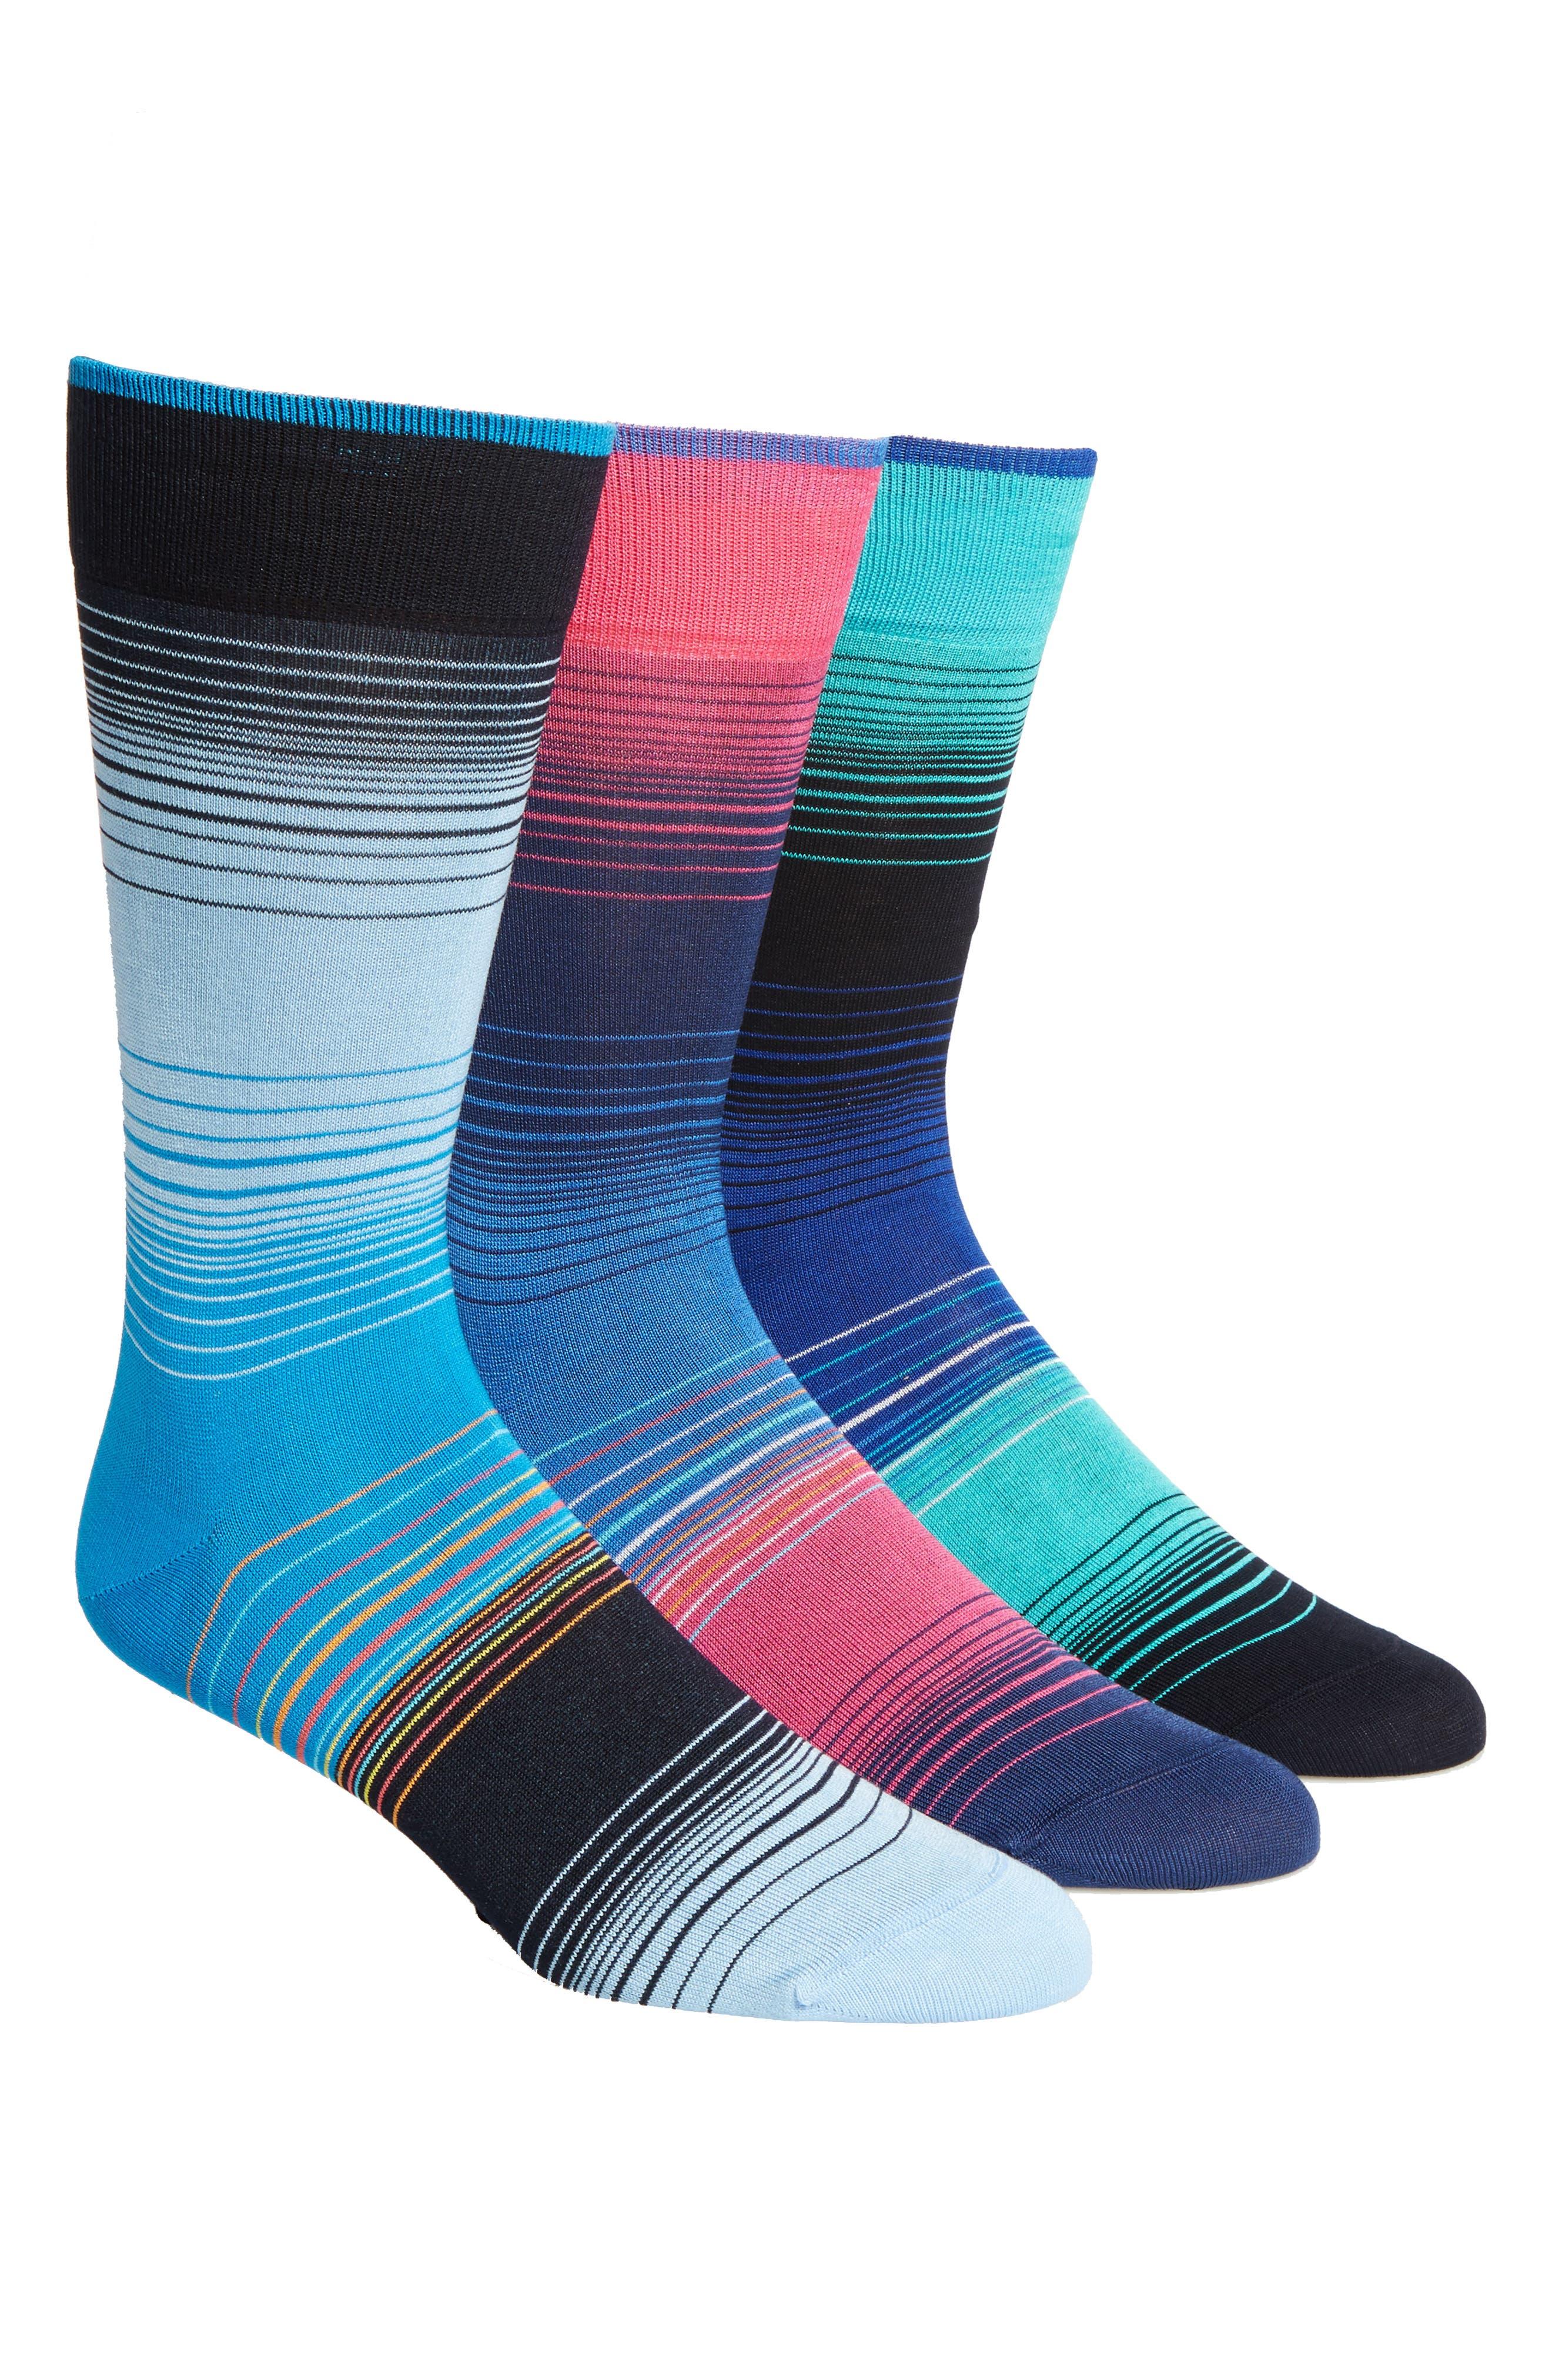 Main Image - Bugatchi 3-Pack Cotton Blend Socks